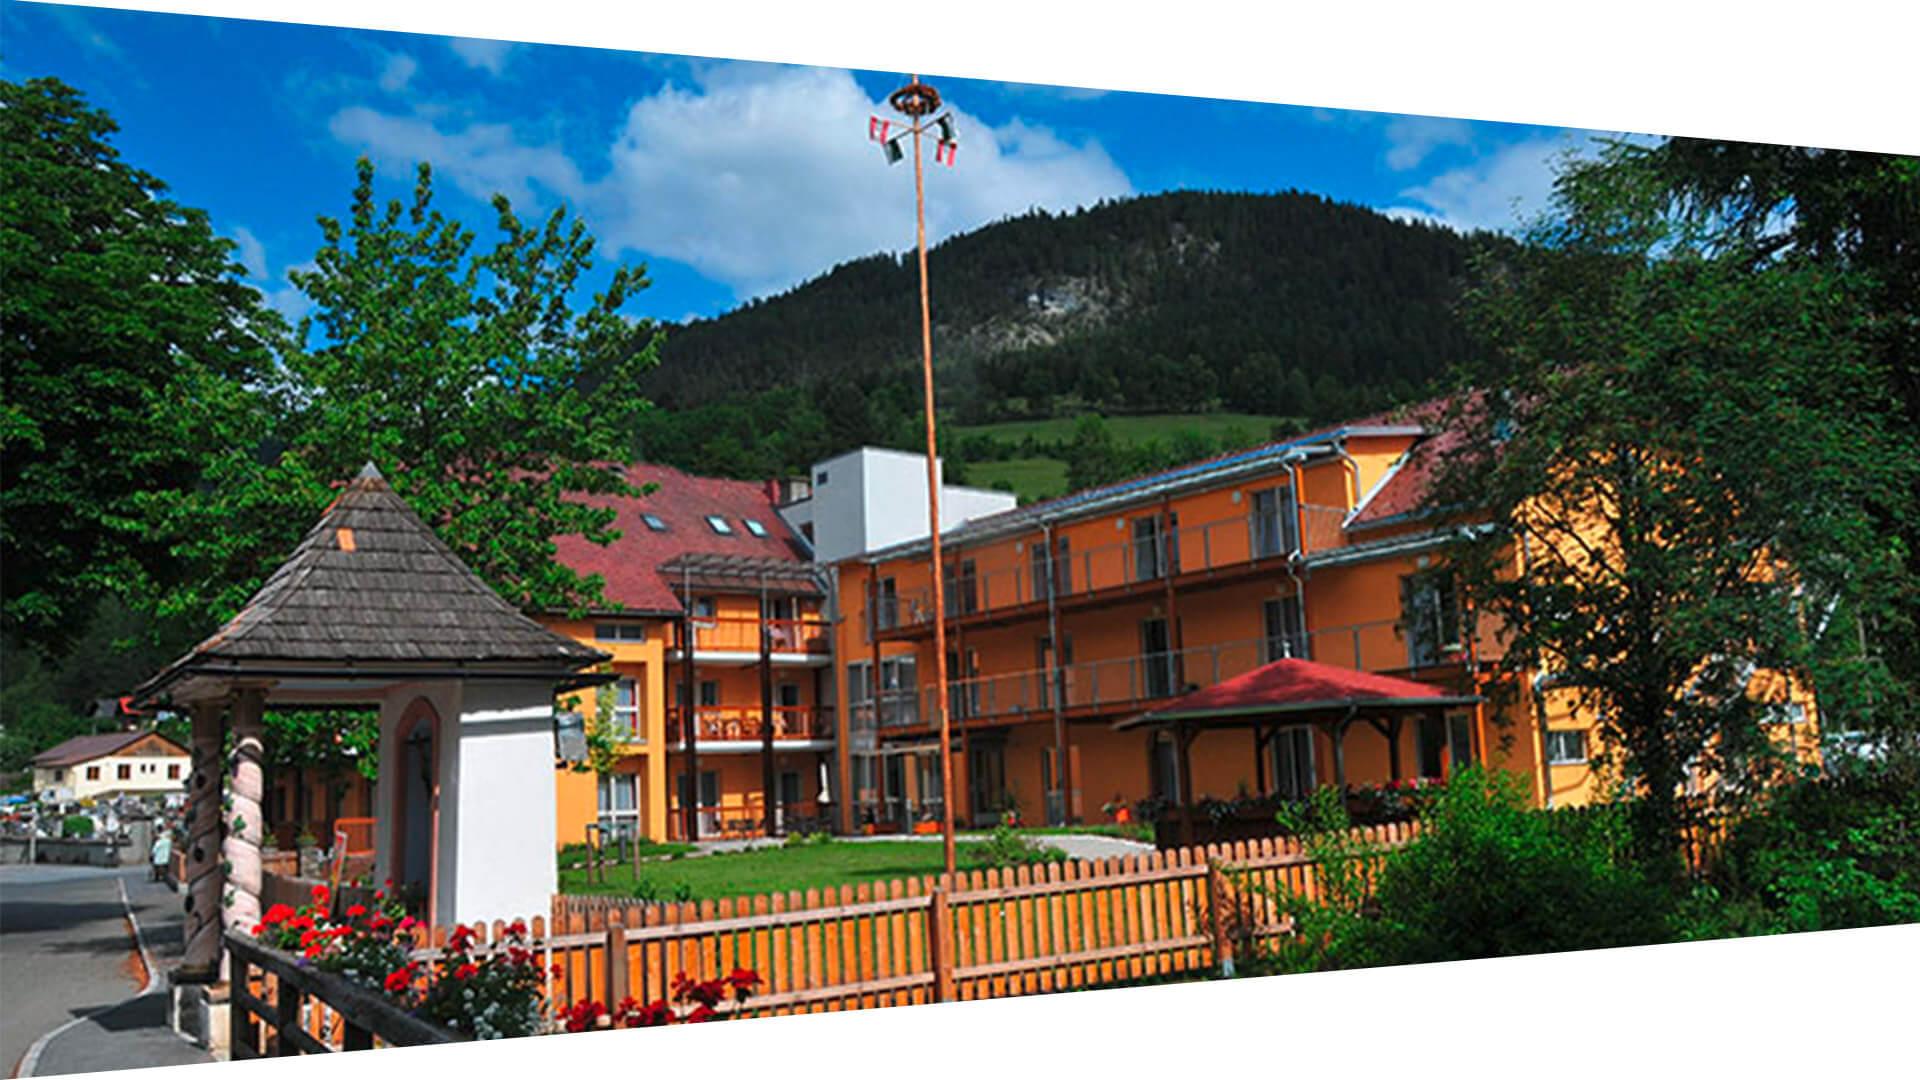 Seniorenheim-Oberwölz